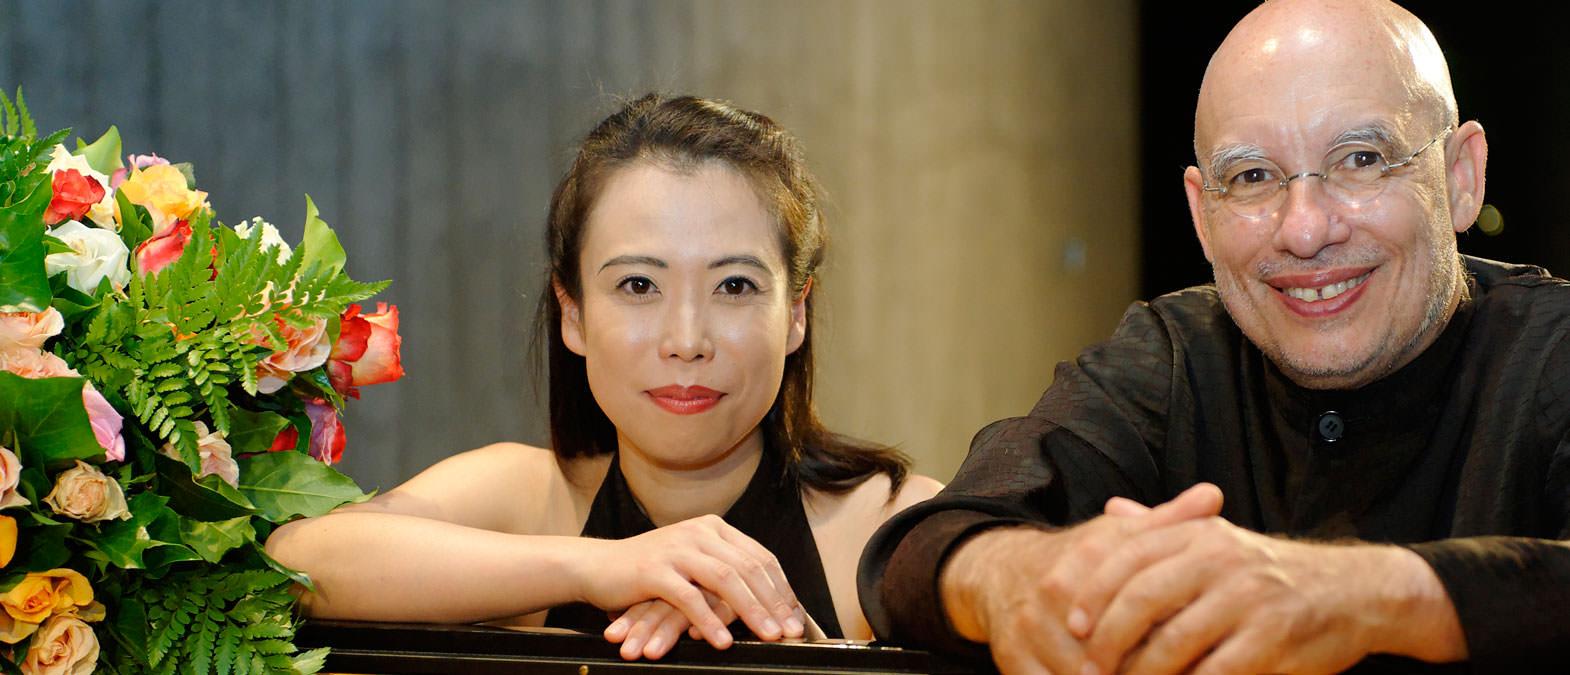 Klavier festival ruhr einzelansicht konzert for Aaron copland el salon mexico score